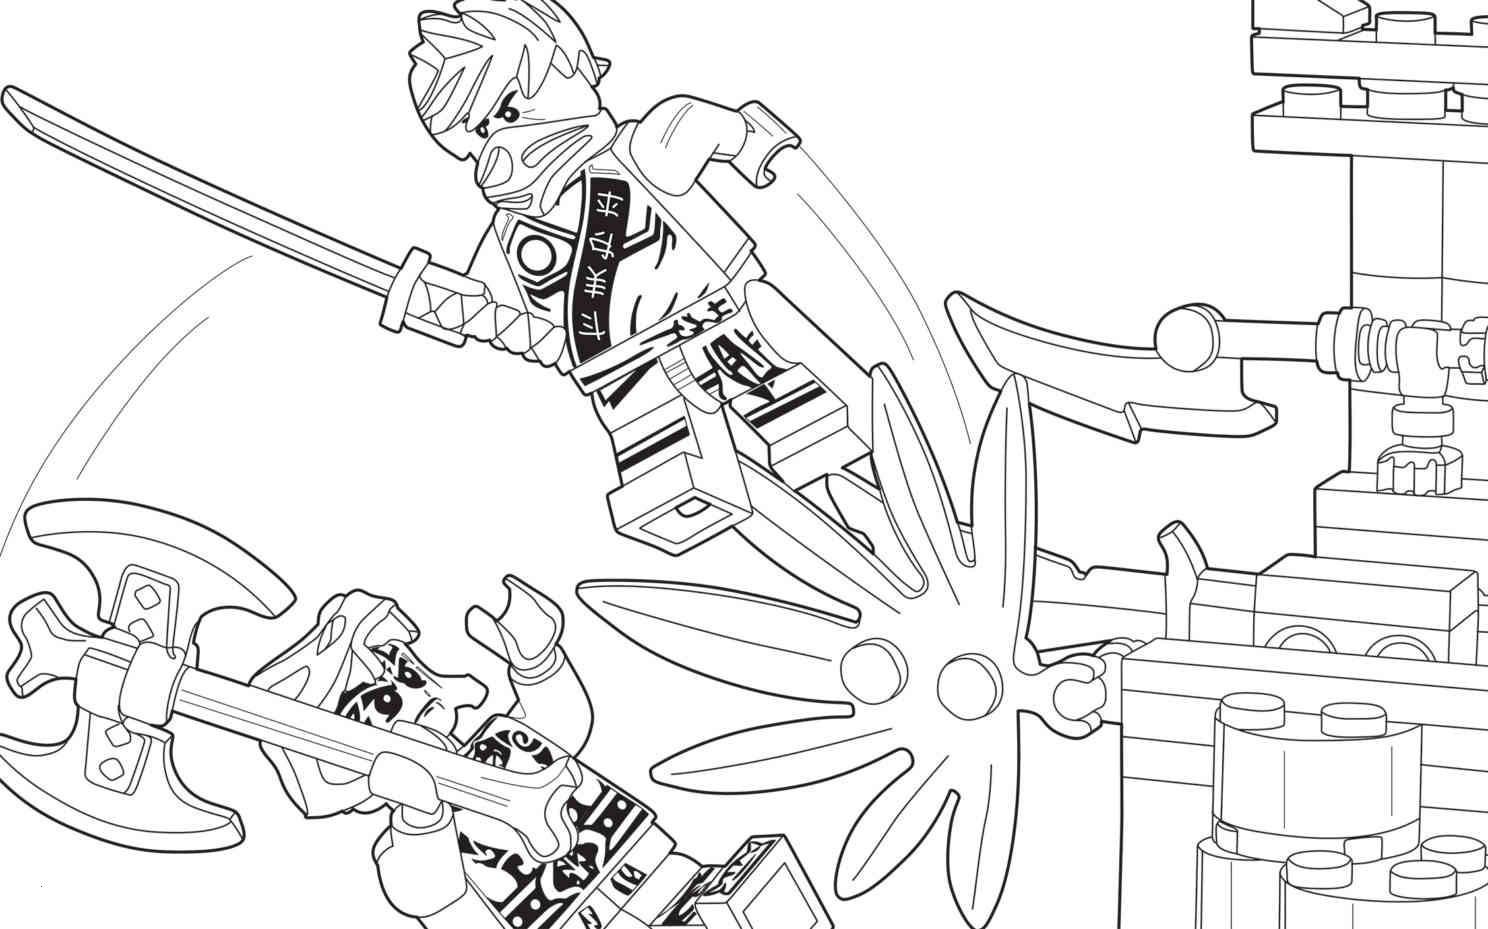 Ninjago Lego Ausmalbilder Einzigartig Ninjago Malvorlagen Zum Ausdrucken Schön 37 Lego Ninjago Lloyd Stock